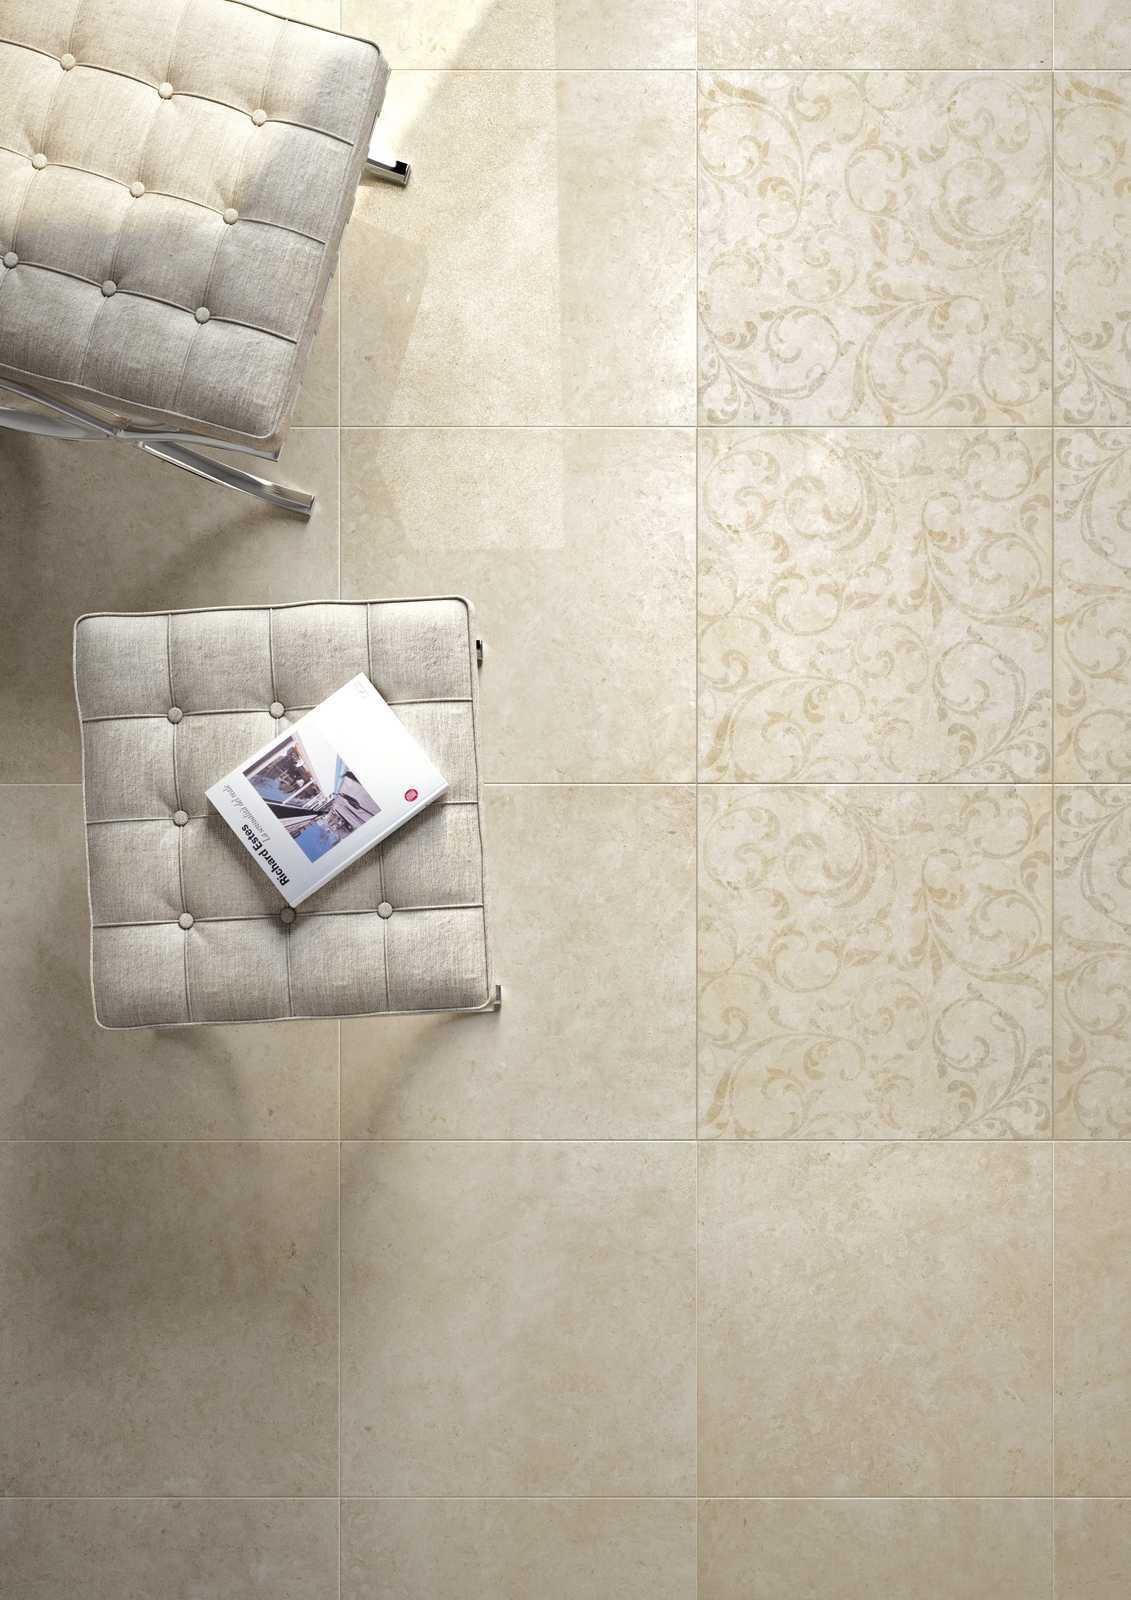 Pietra di noto porcelain stoneware flooring marazzi pietra di noto ceramic tiles marazzi4217 dailygadgetfo Choice Image